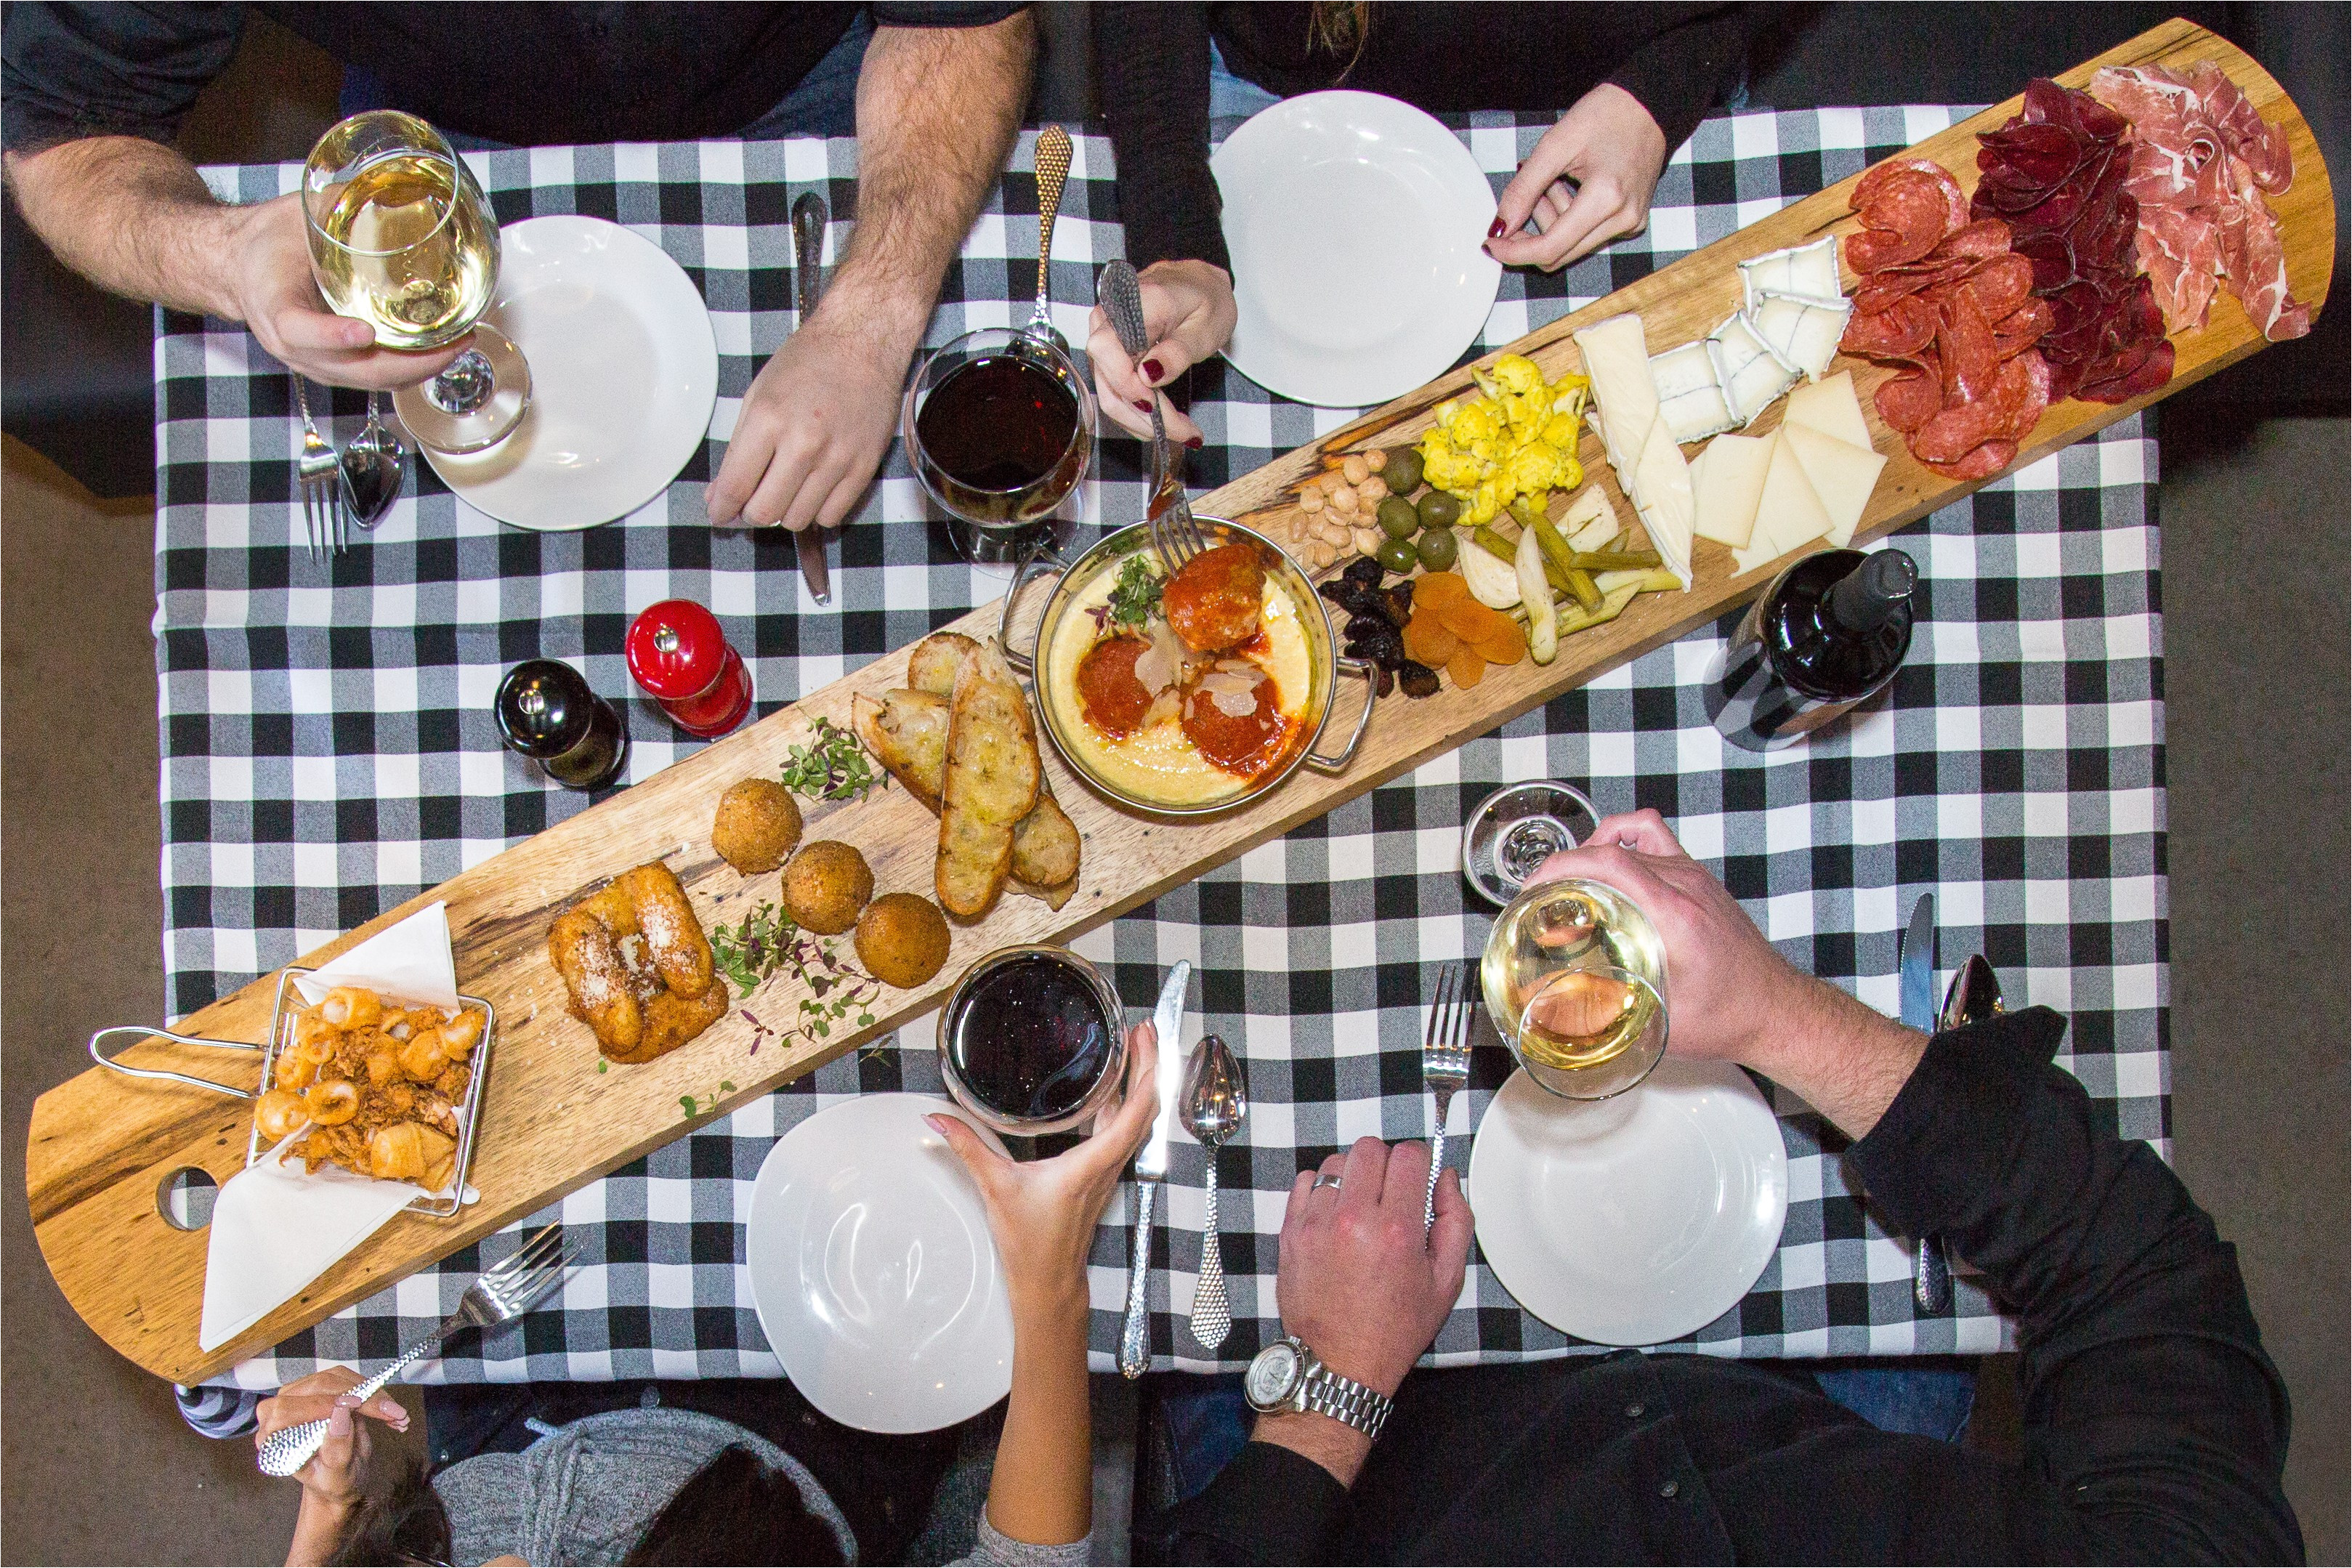 the charcuterie board at the sicilian butcher